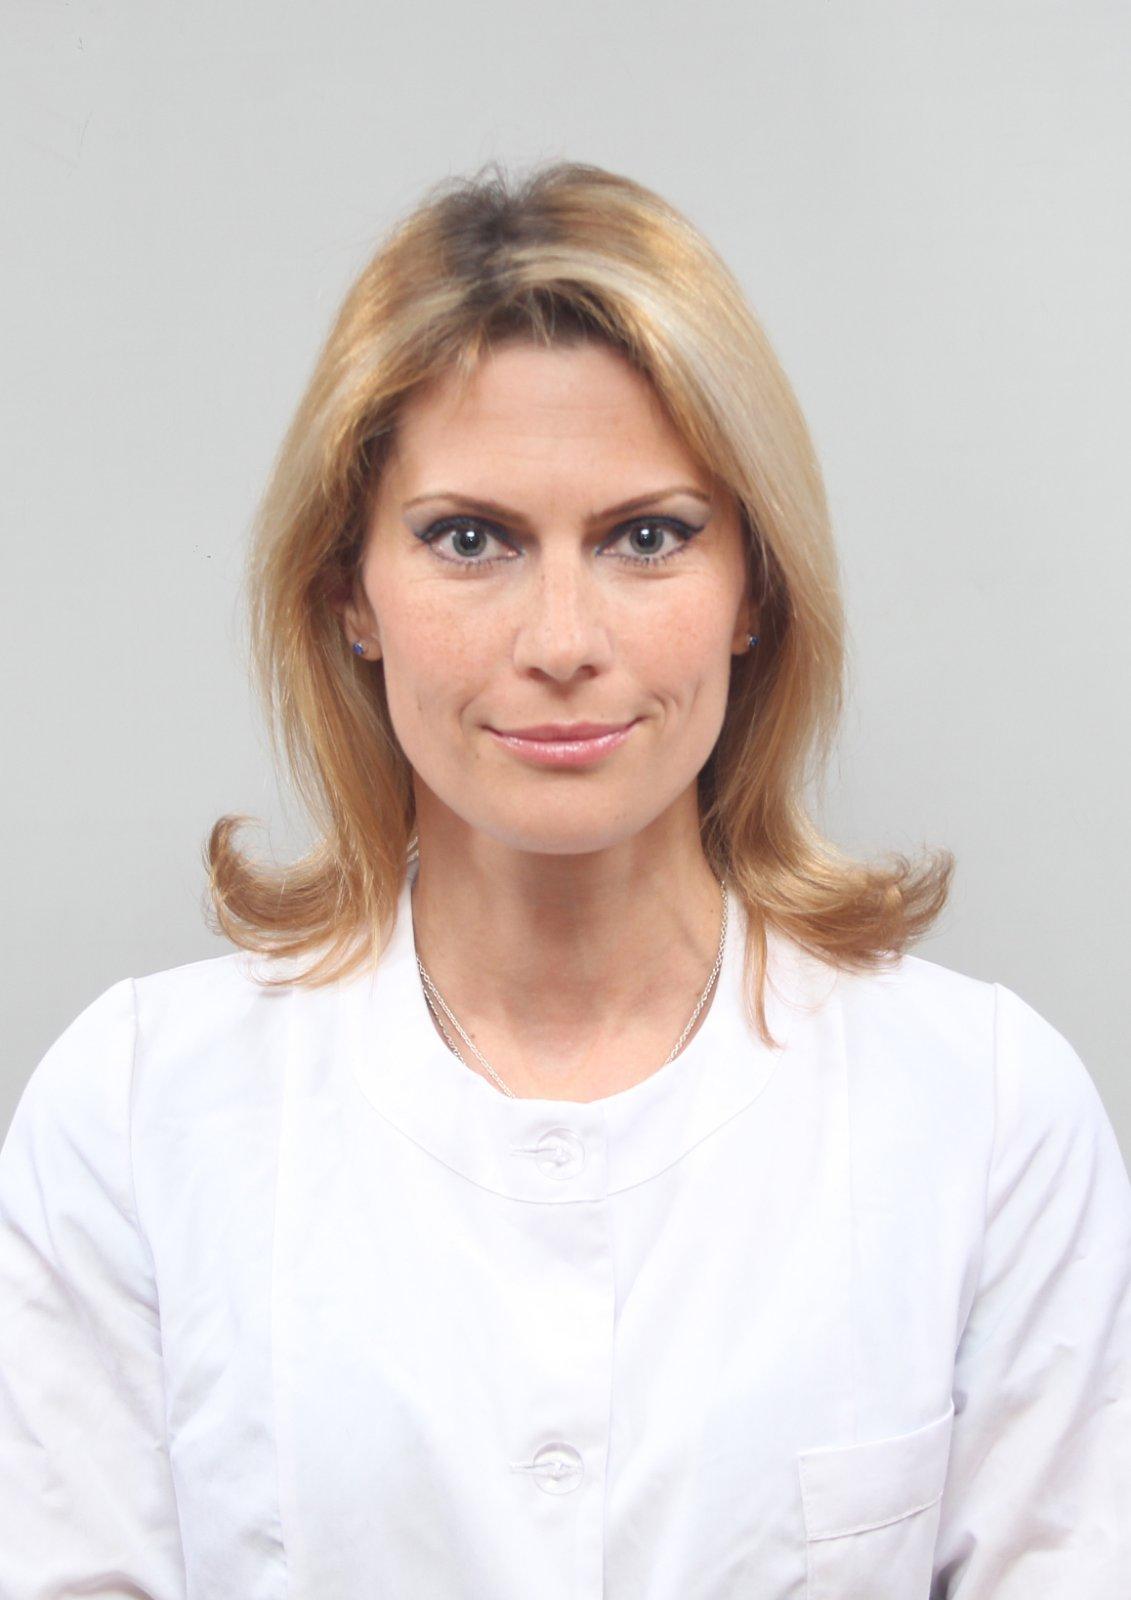 д-р Марта Михайлова